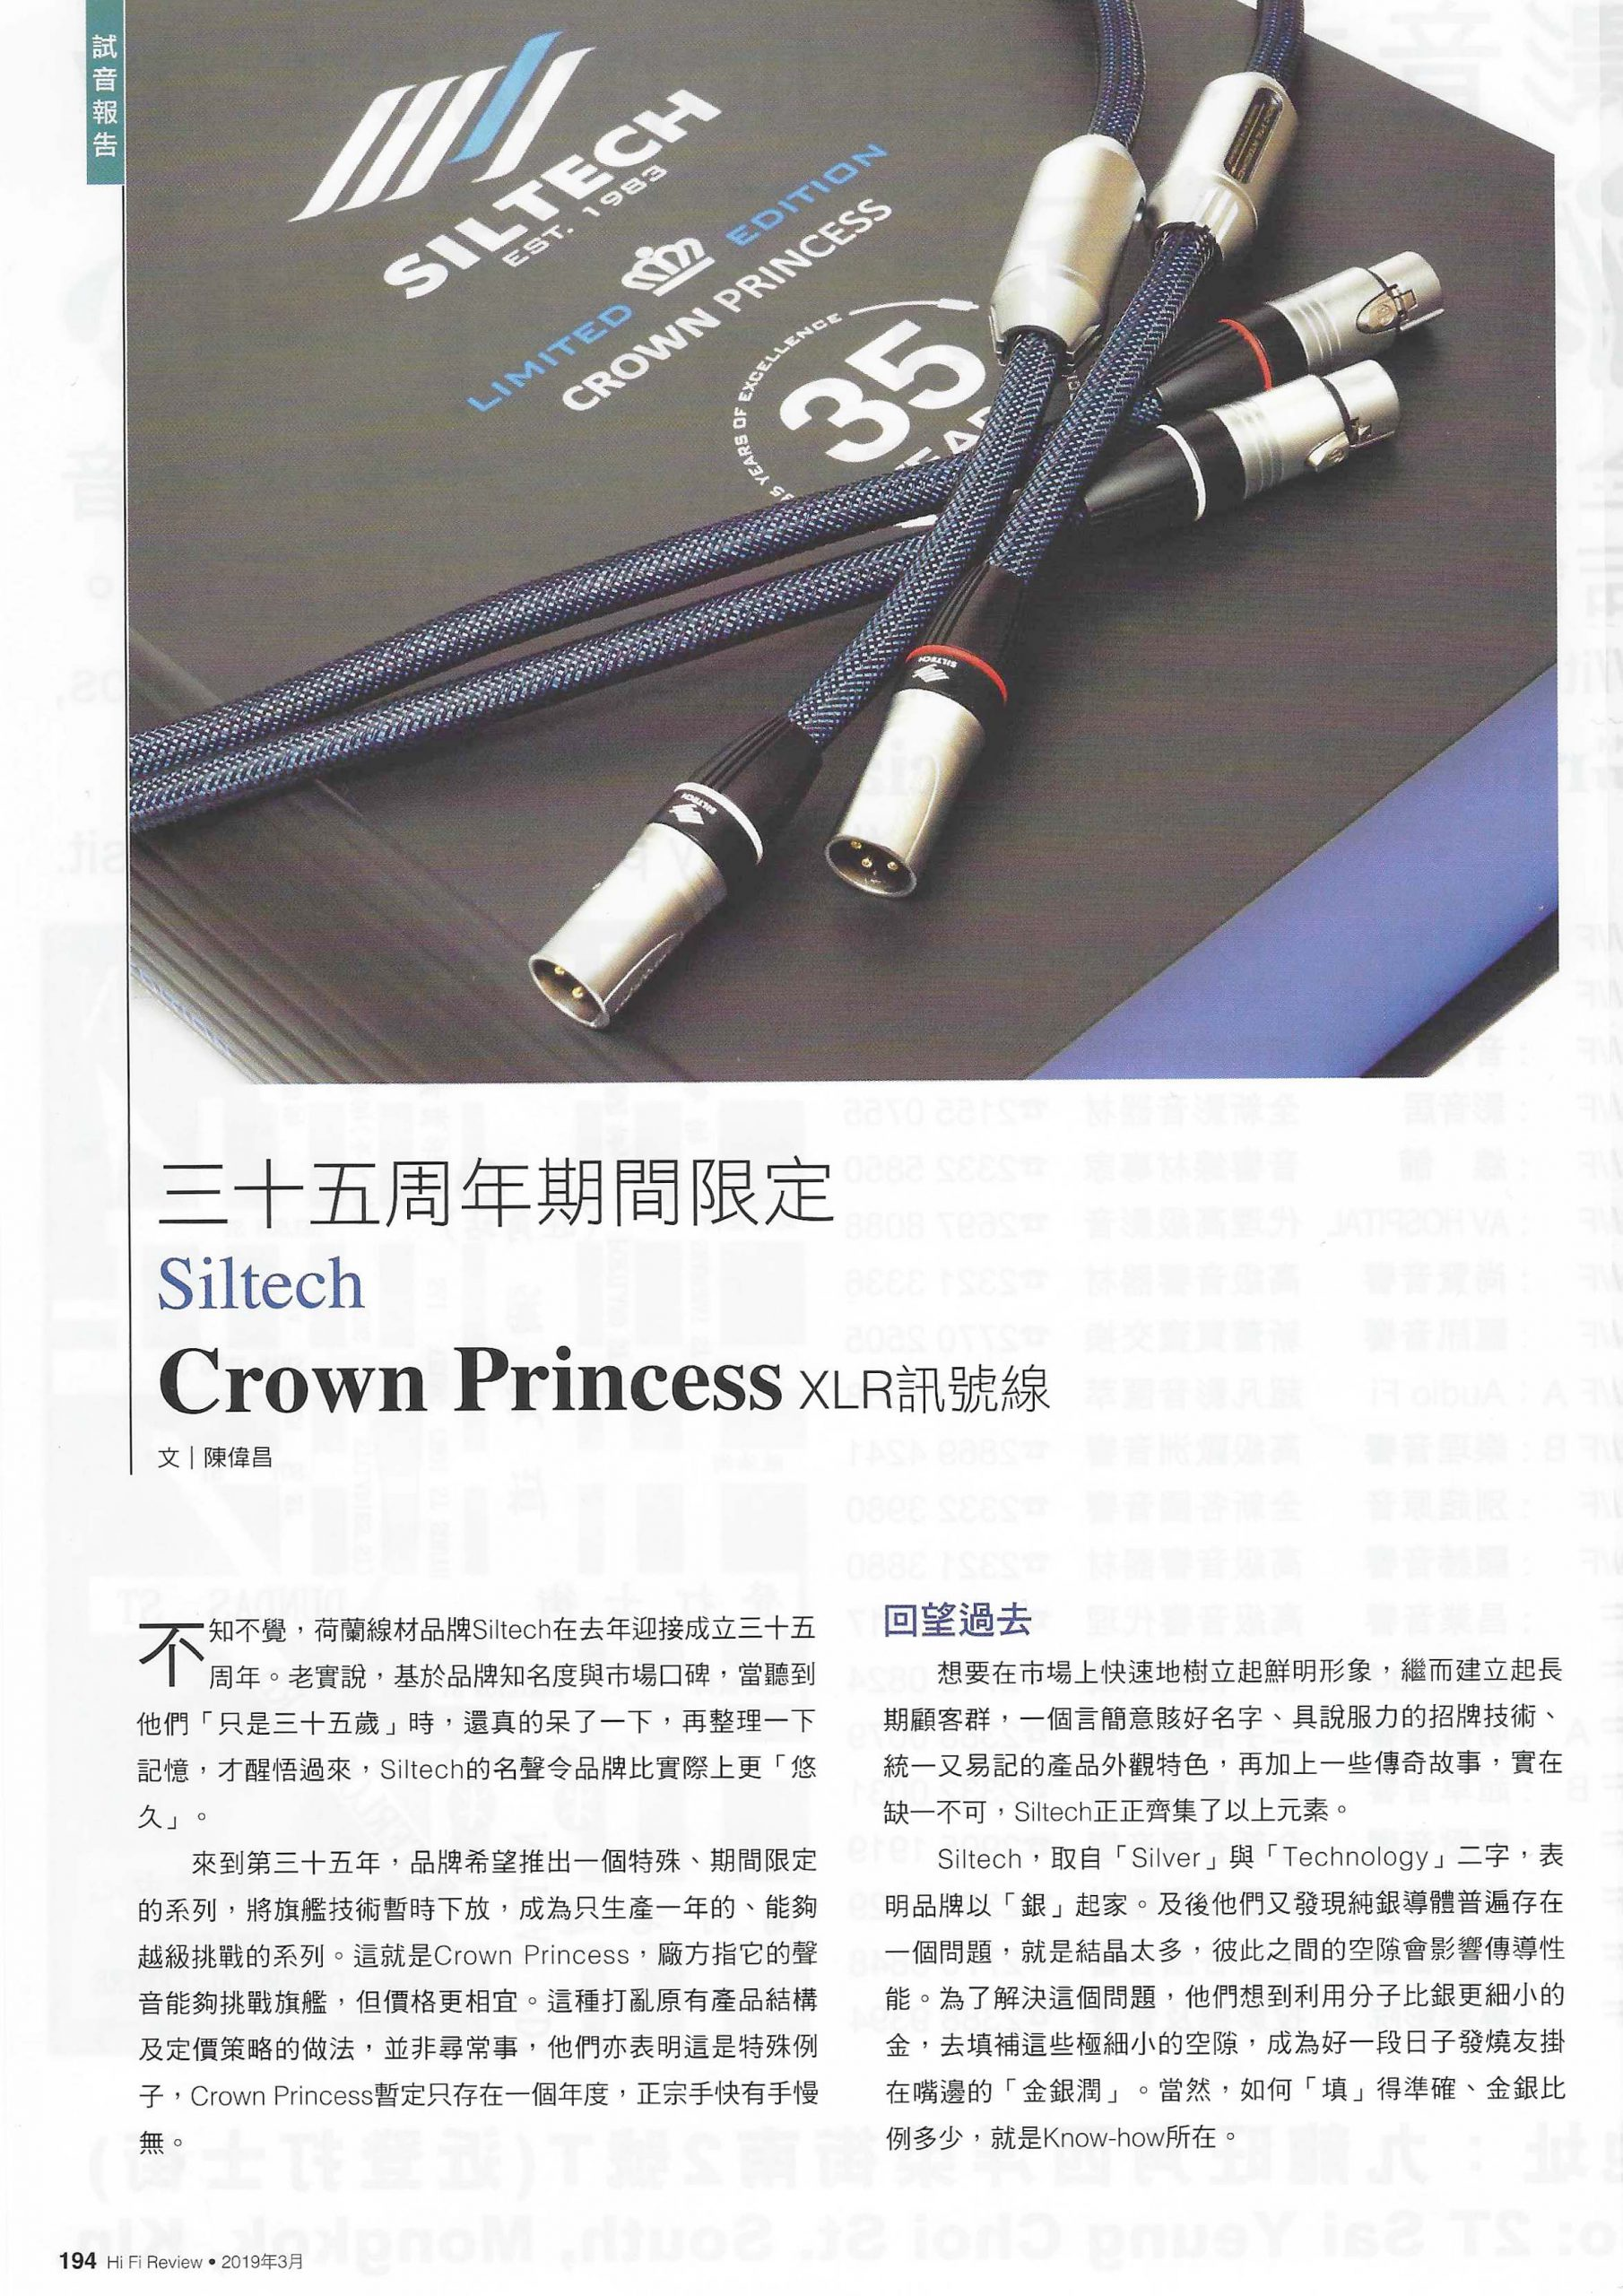 Siltech Crown Princess XLR connector Audio Cable